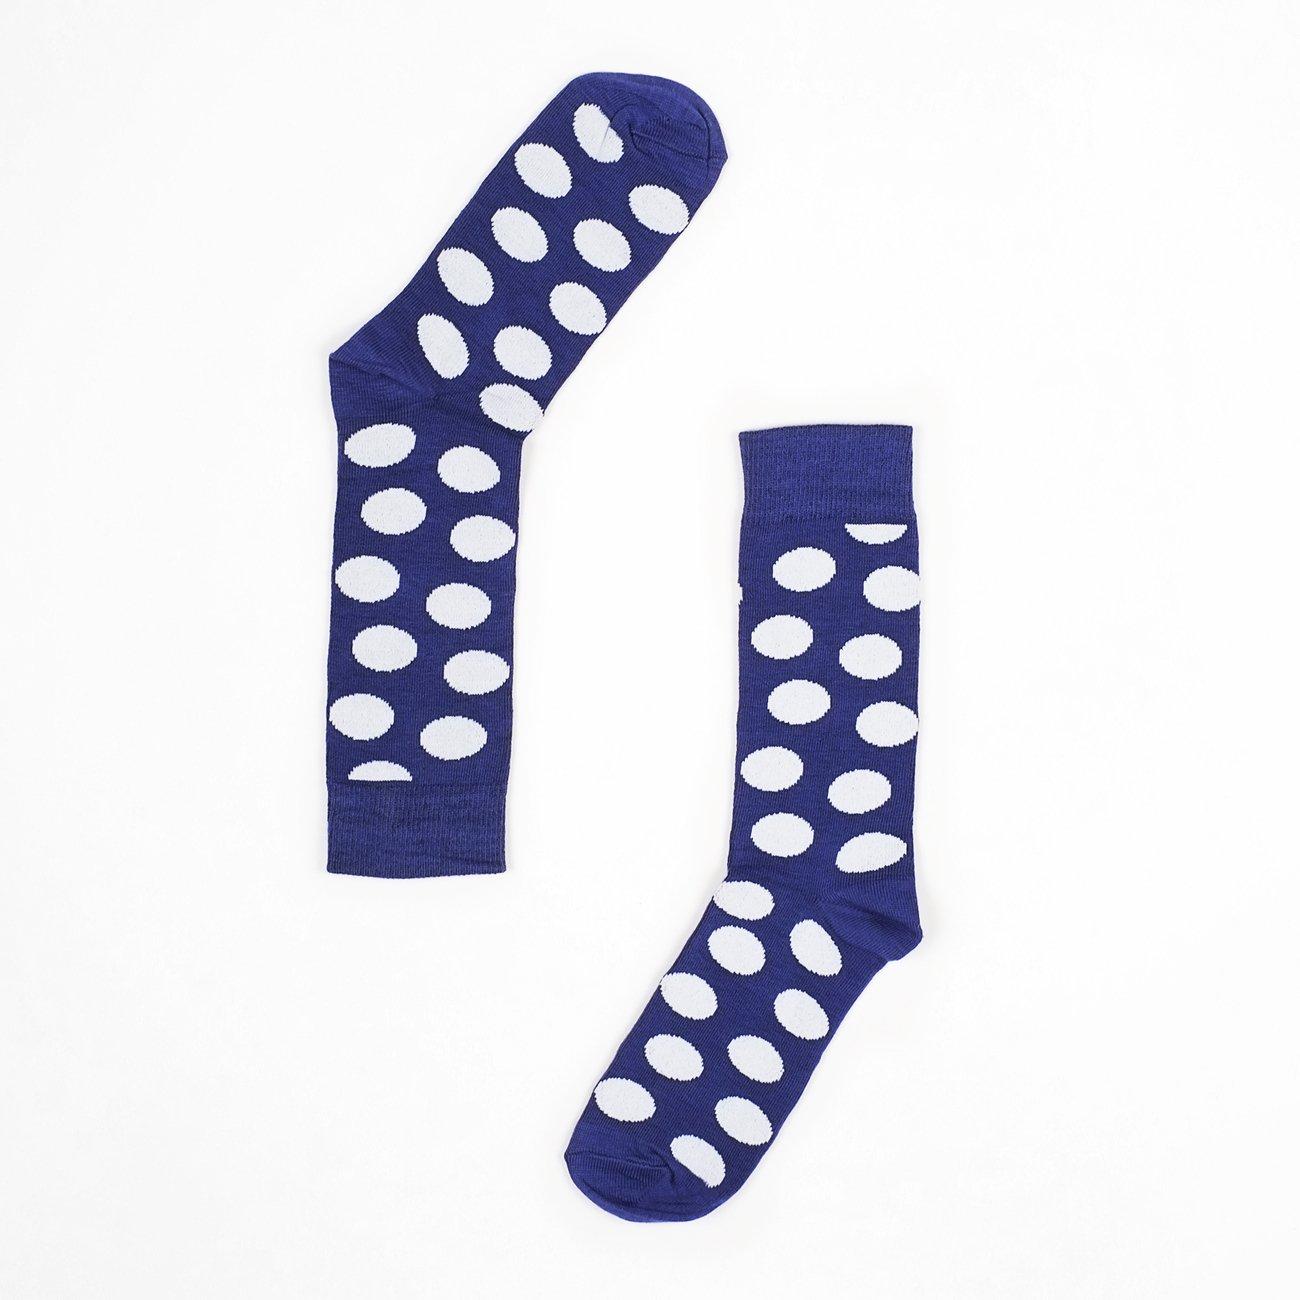 Socks Sigtuna Big Dots